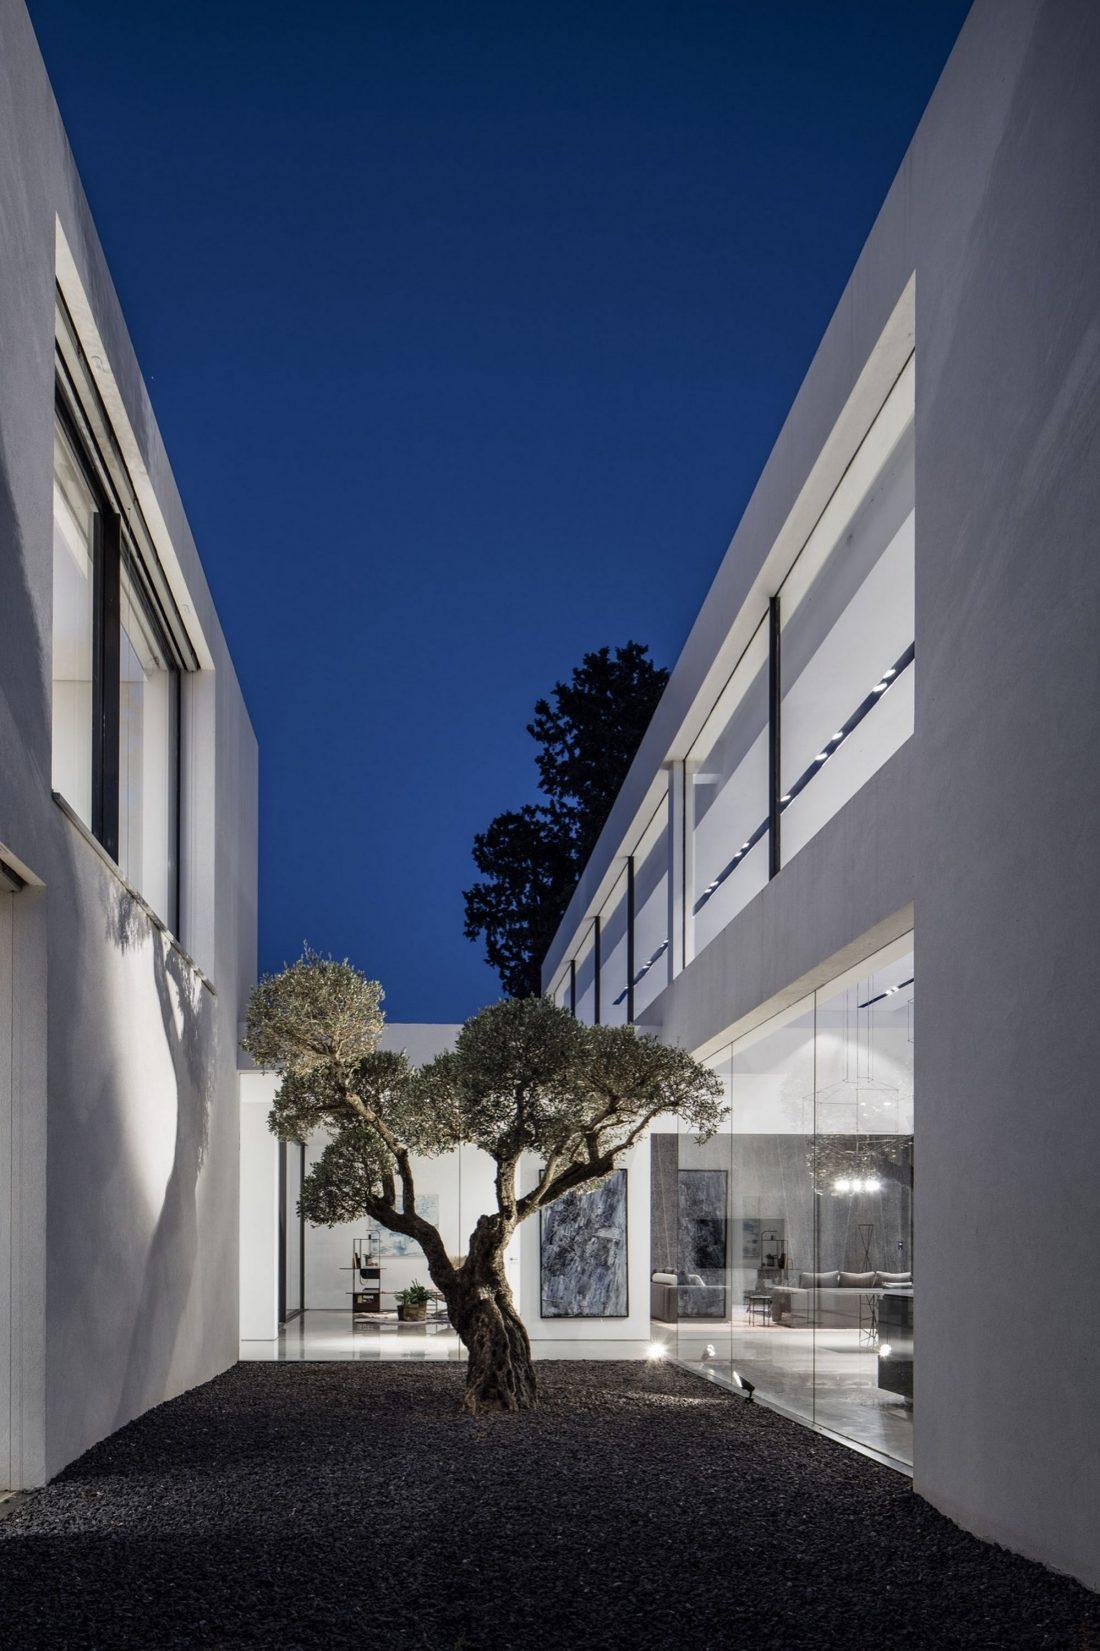 700-kvadratnyh-metrov-sveta-f-house-po-proektu-studii-pitsou-kedem-5